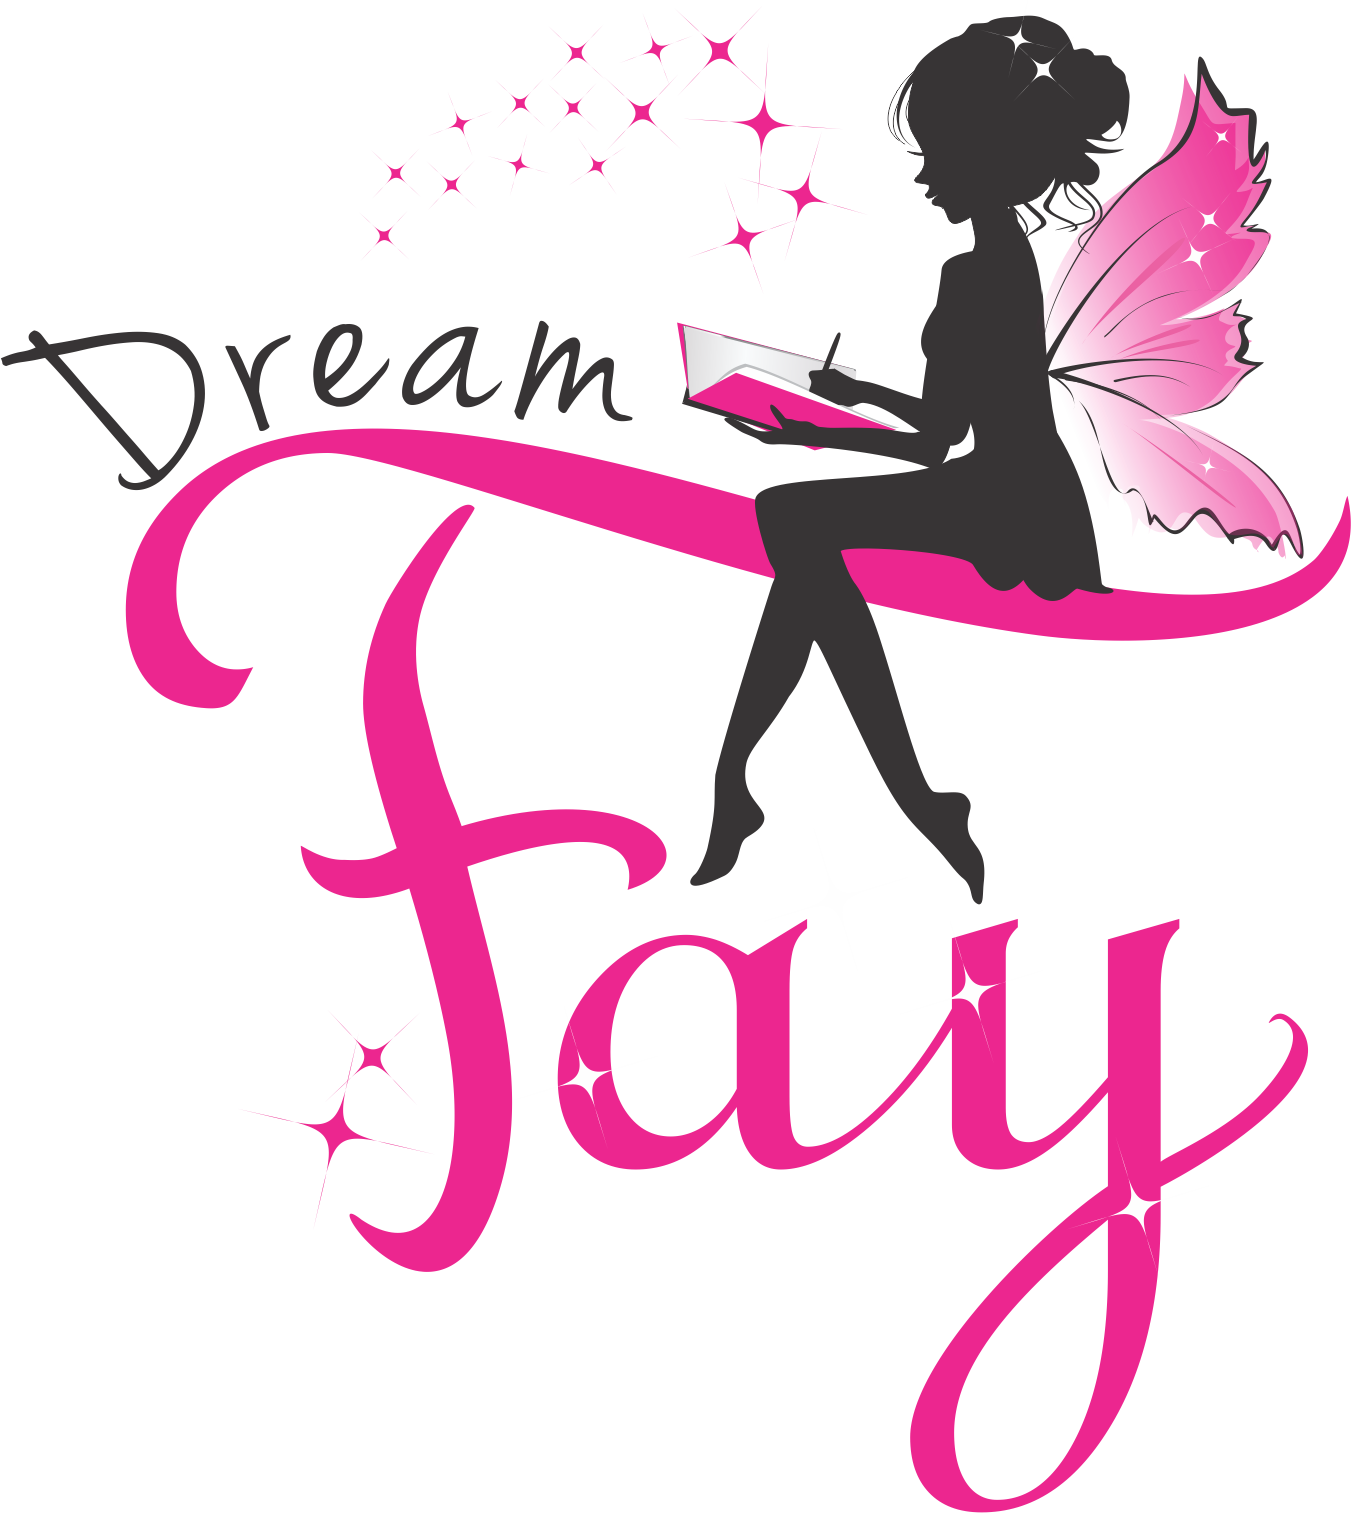 Create a sexy fairy silhouette for Dream Fay